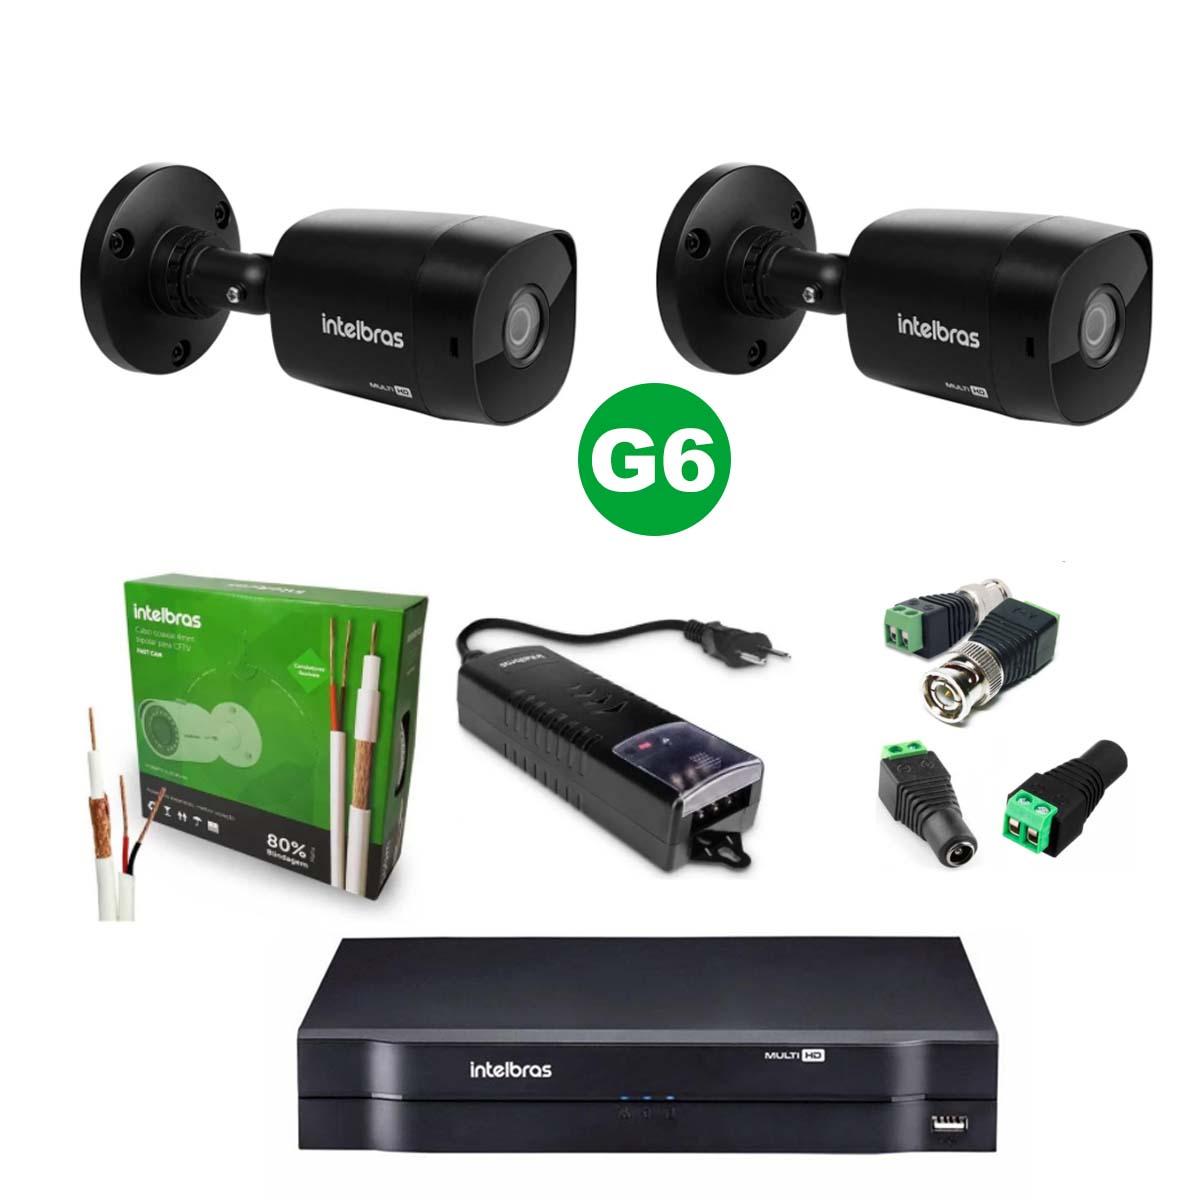 Kit CFTV 02 Câmeras VHD 1220 Black G6 + MHDX 1108 S/ HD + Acessórios